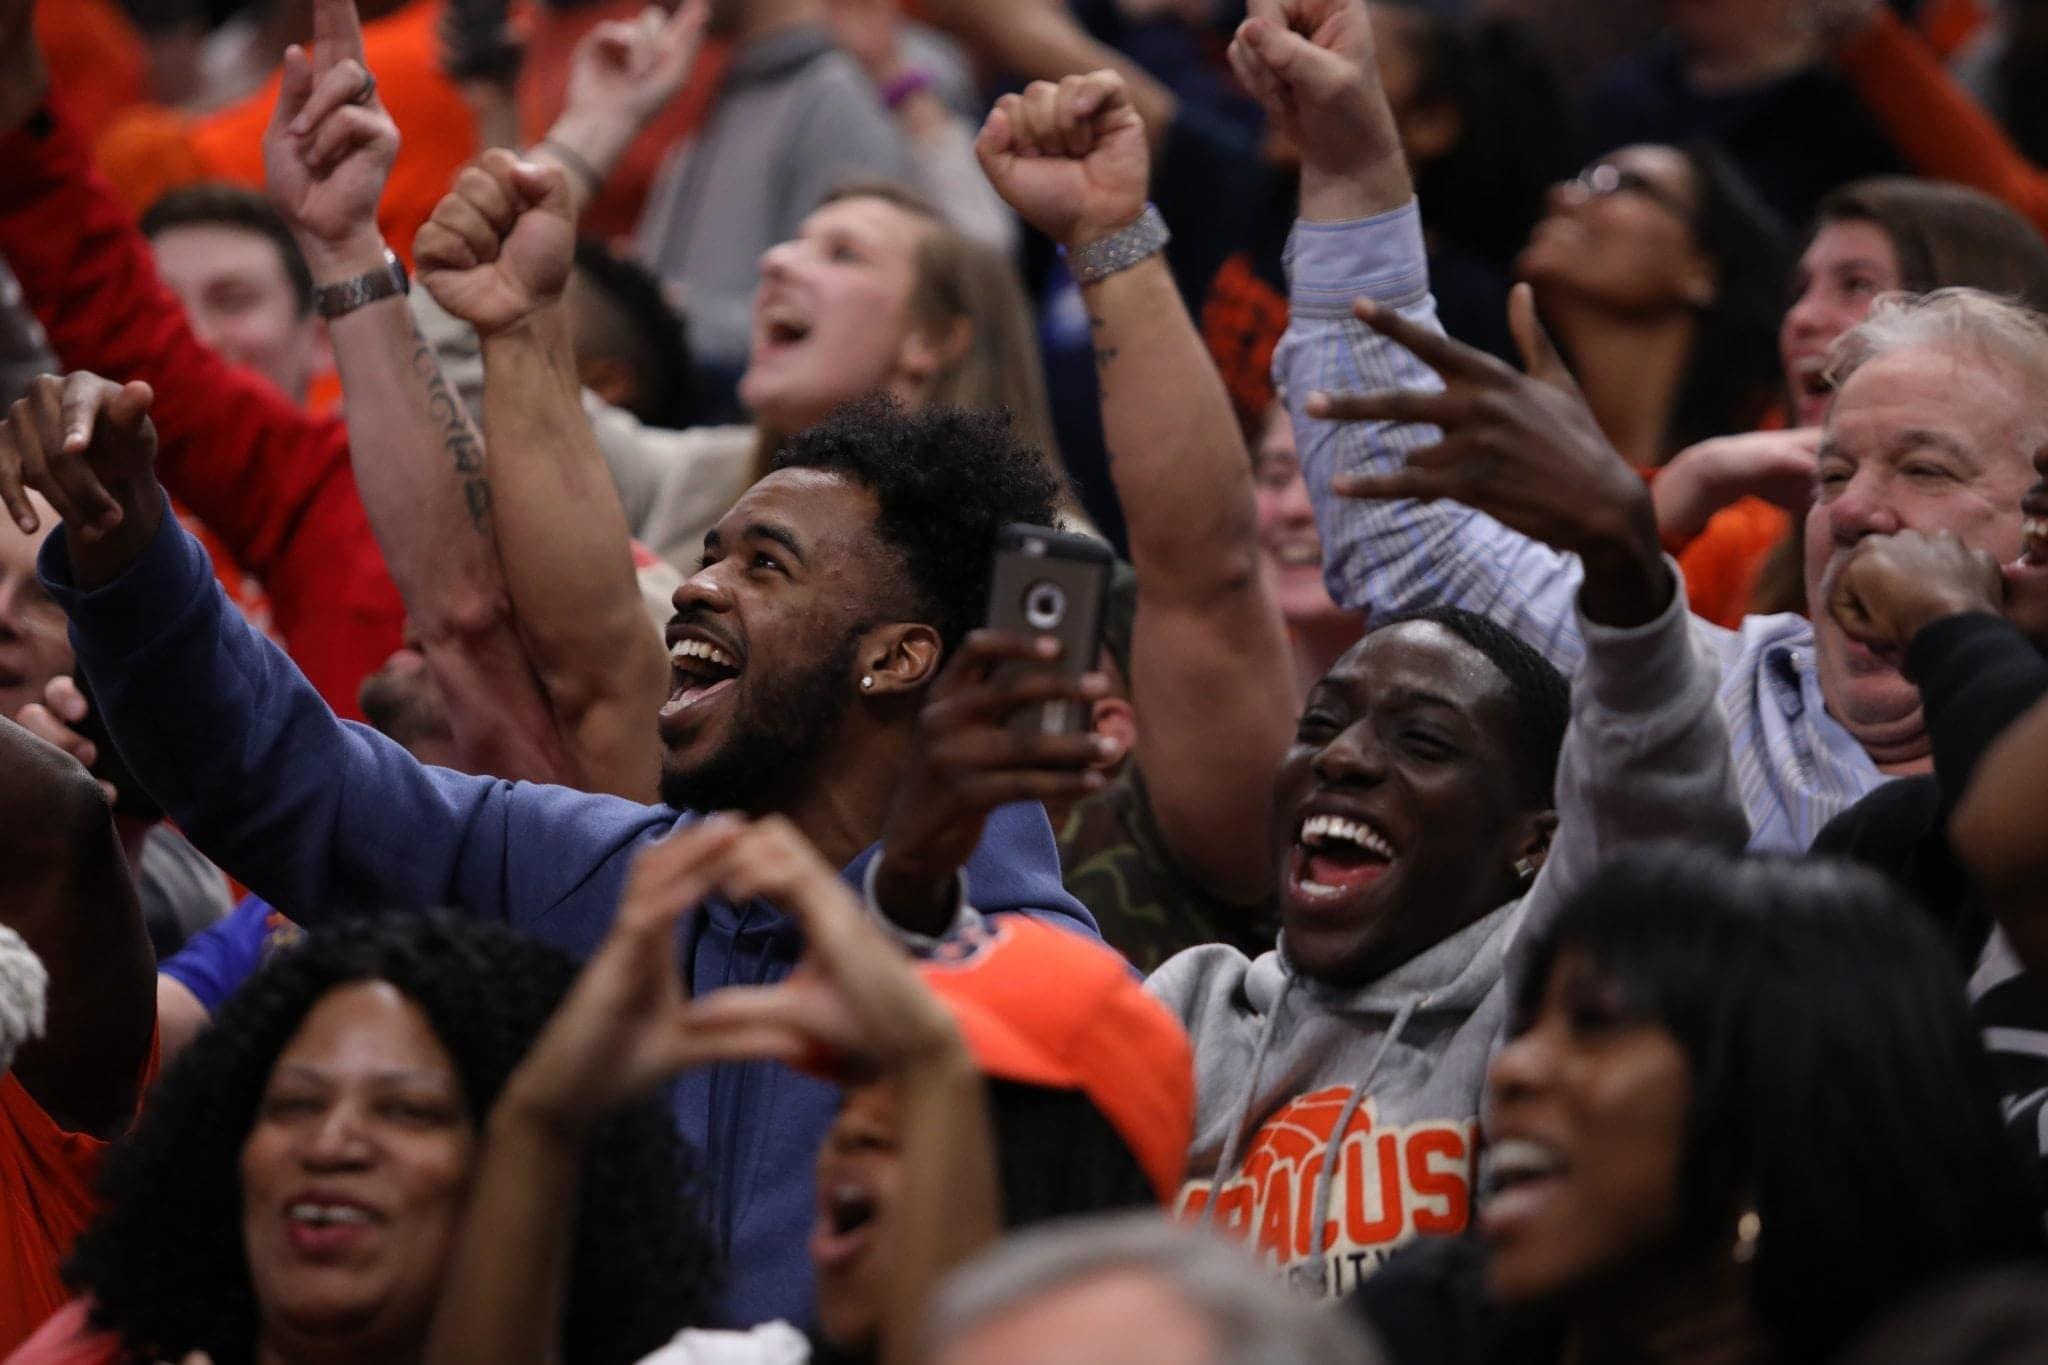 SU vs. Michigan State: Fans go wild with every shot SU makes.